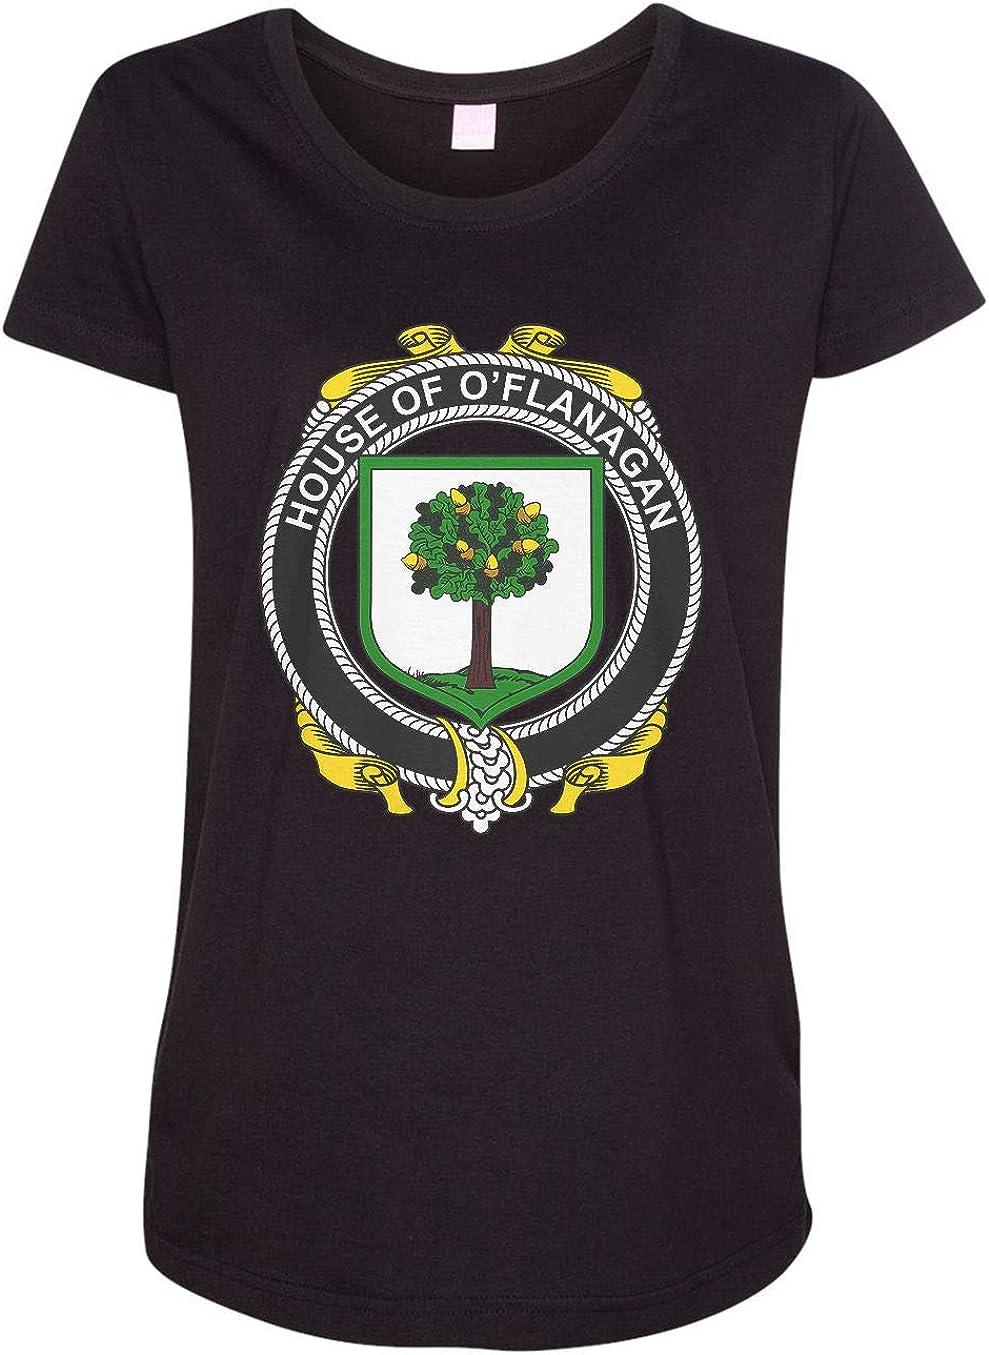 HARD EDGE DESIGN Women's Irish House Heraldry O'Flanagan T-Shirt